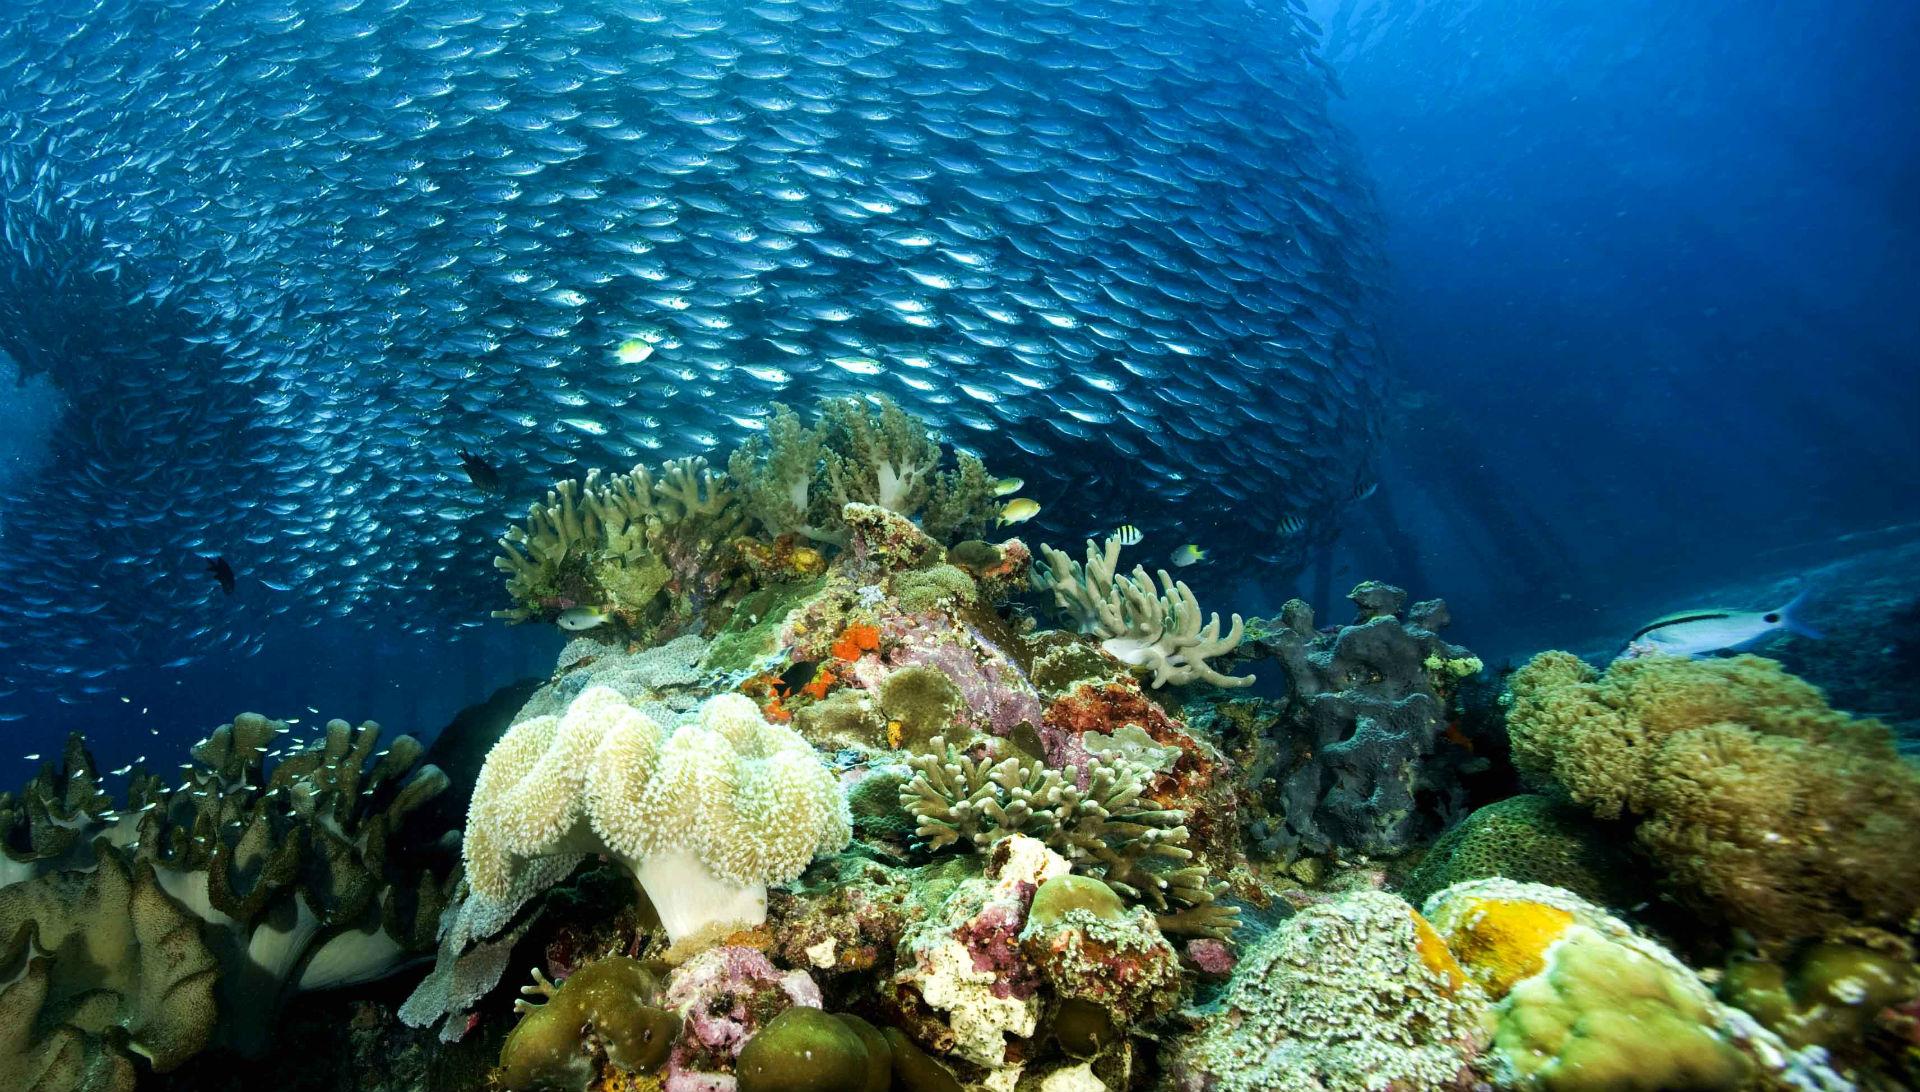 underwater ocean sea nature coral reef tropical school wallpaper 1920x1092